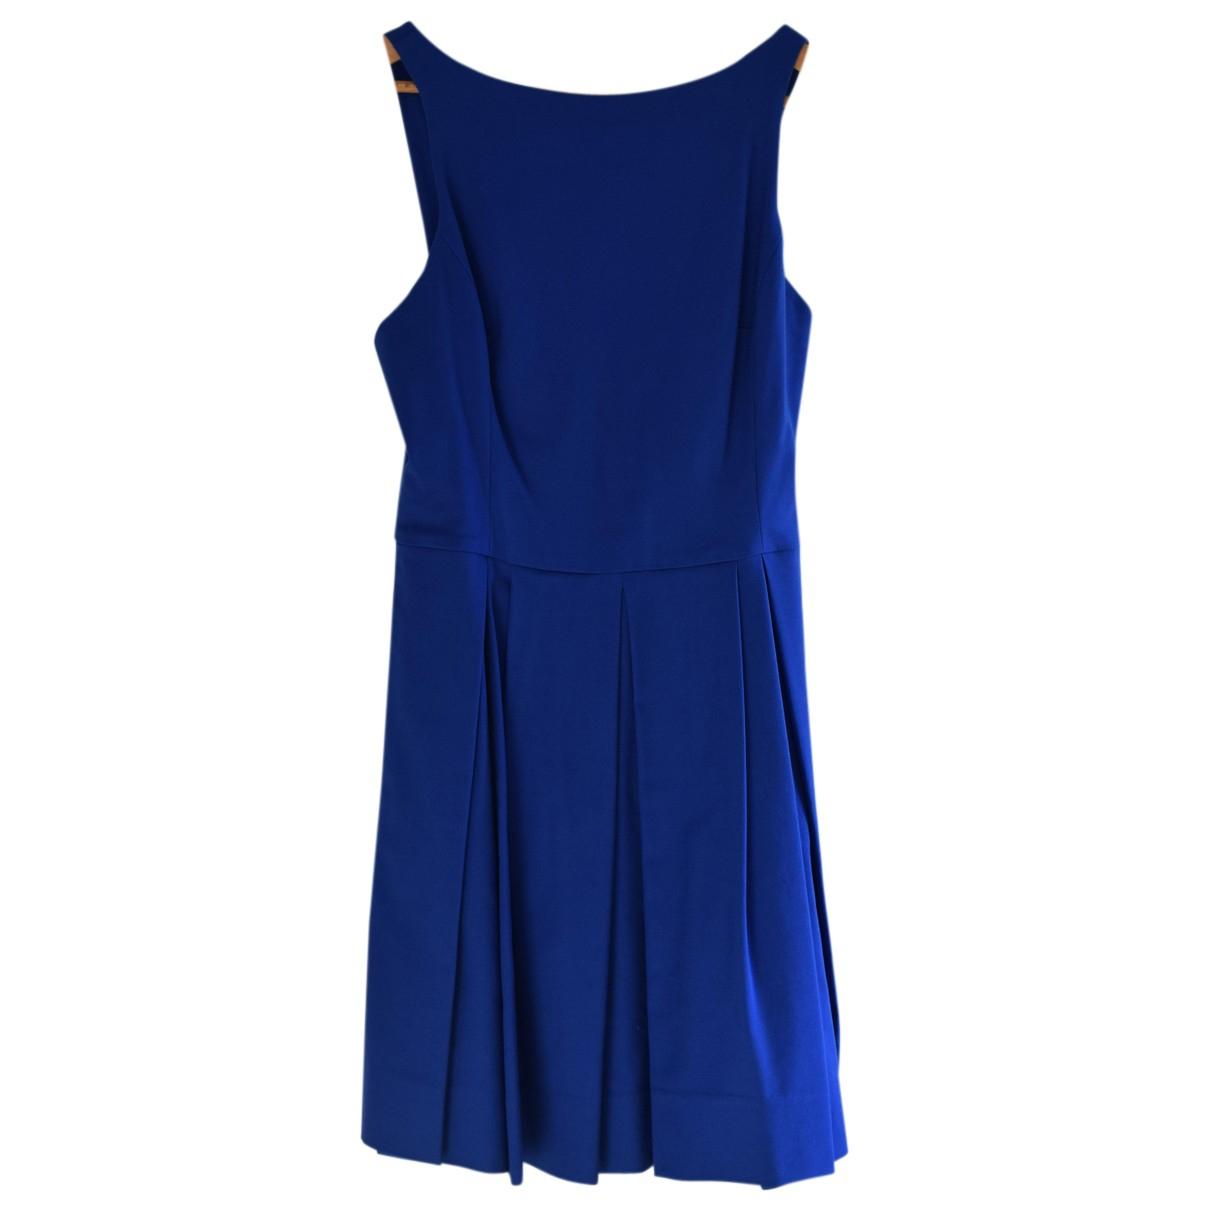 Lauren Ralph Lauren \N Kleid in  Blau Viskose